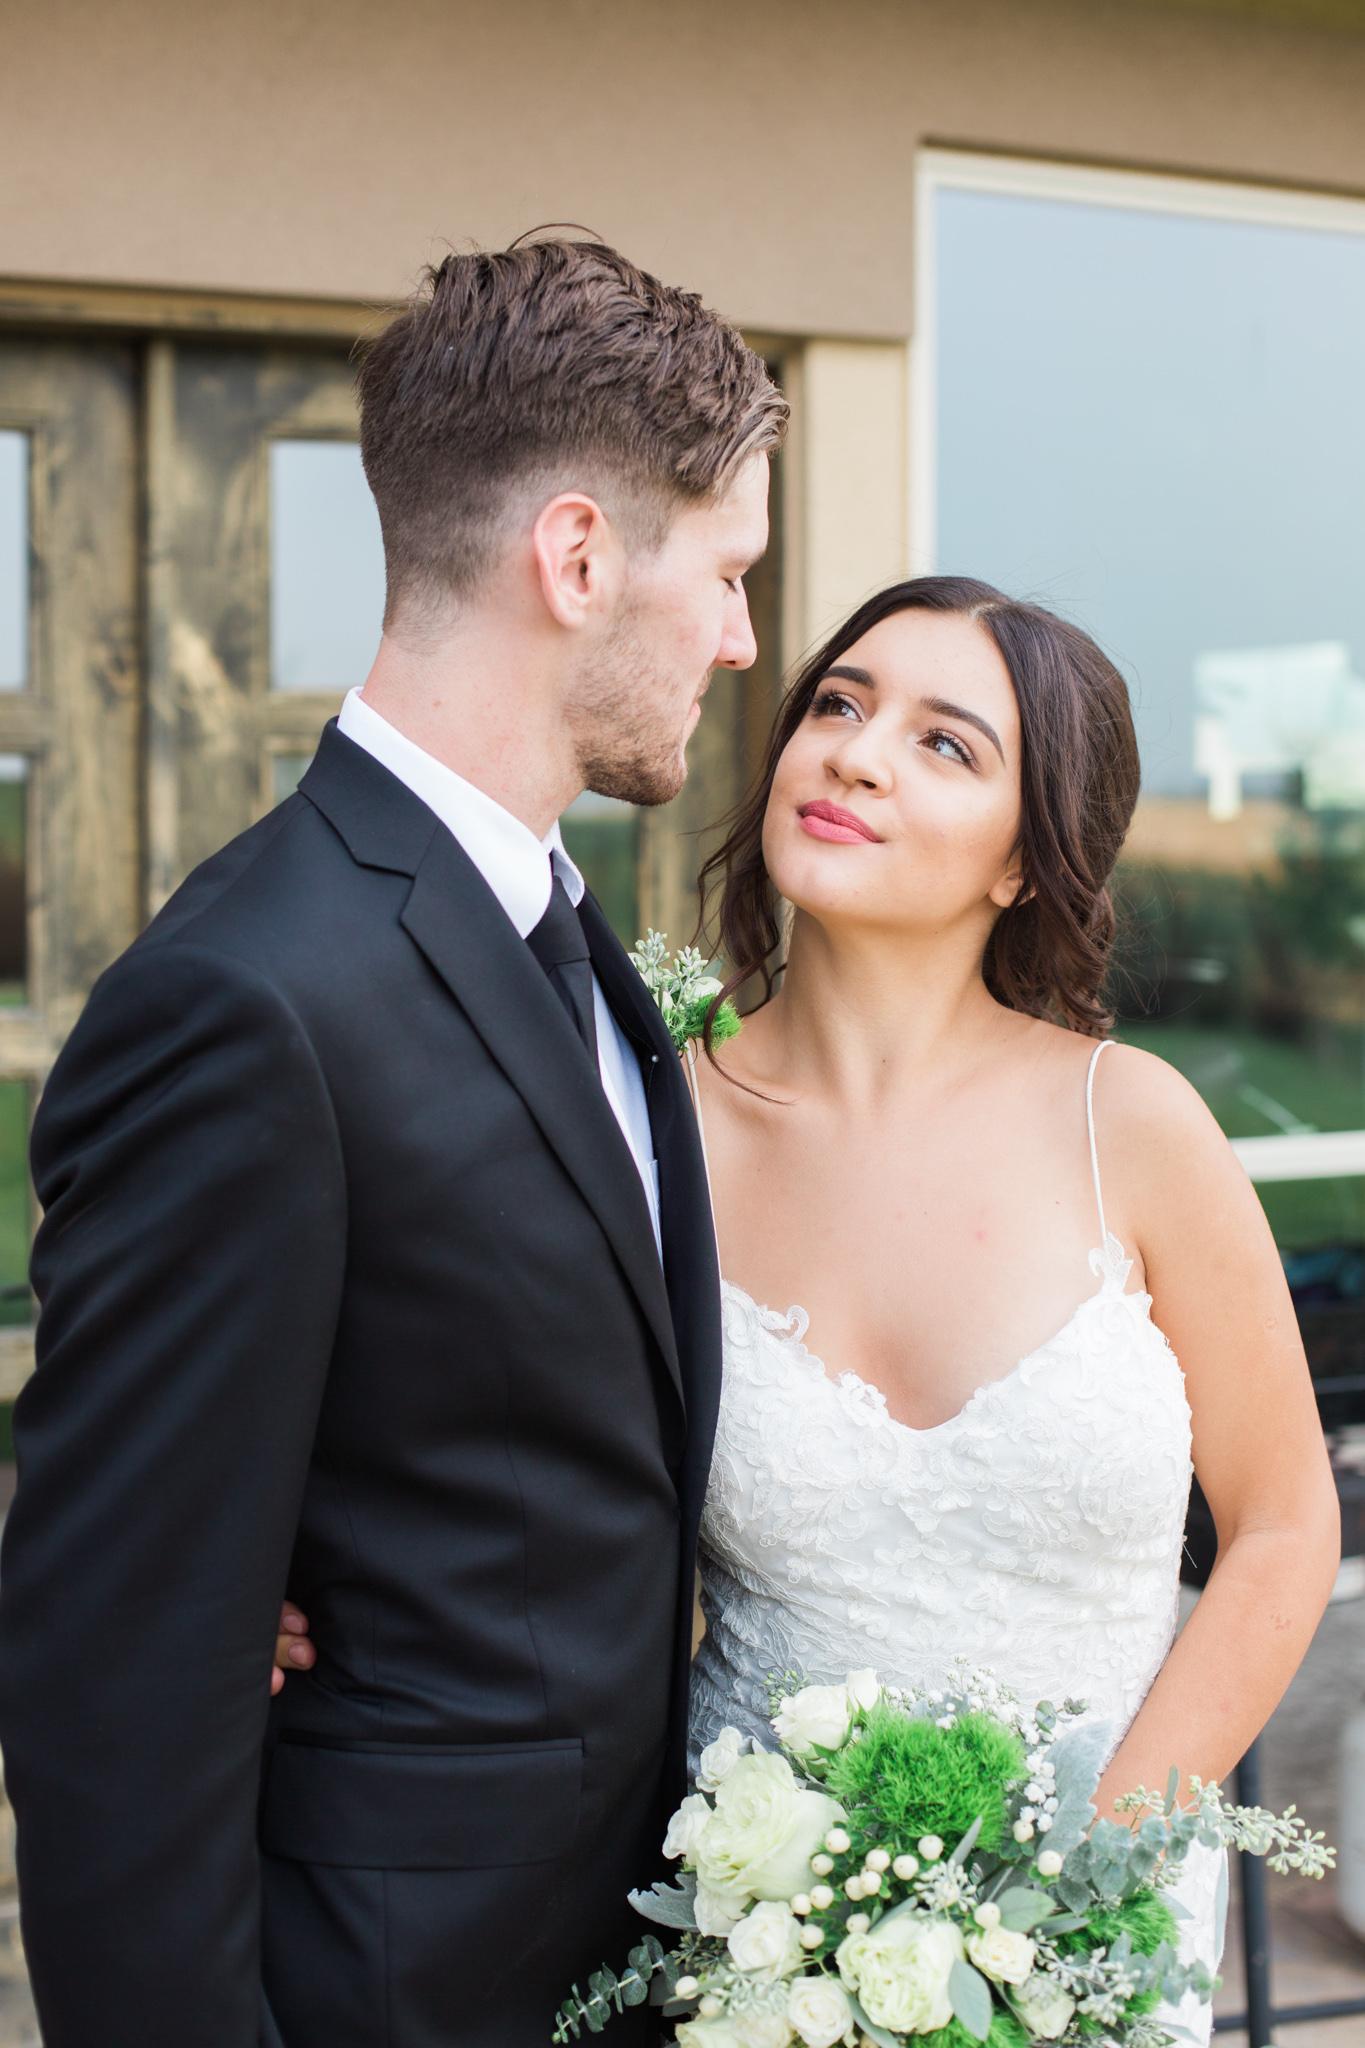 Olga_janni_wedding_090917_WEBSIZE (197 of 704).JPG